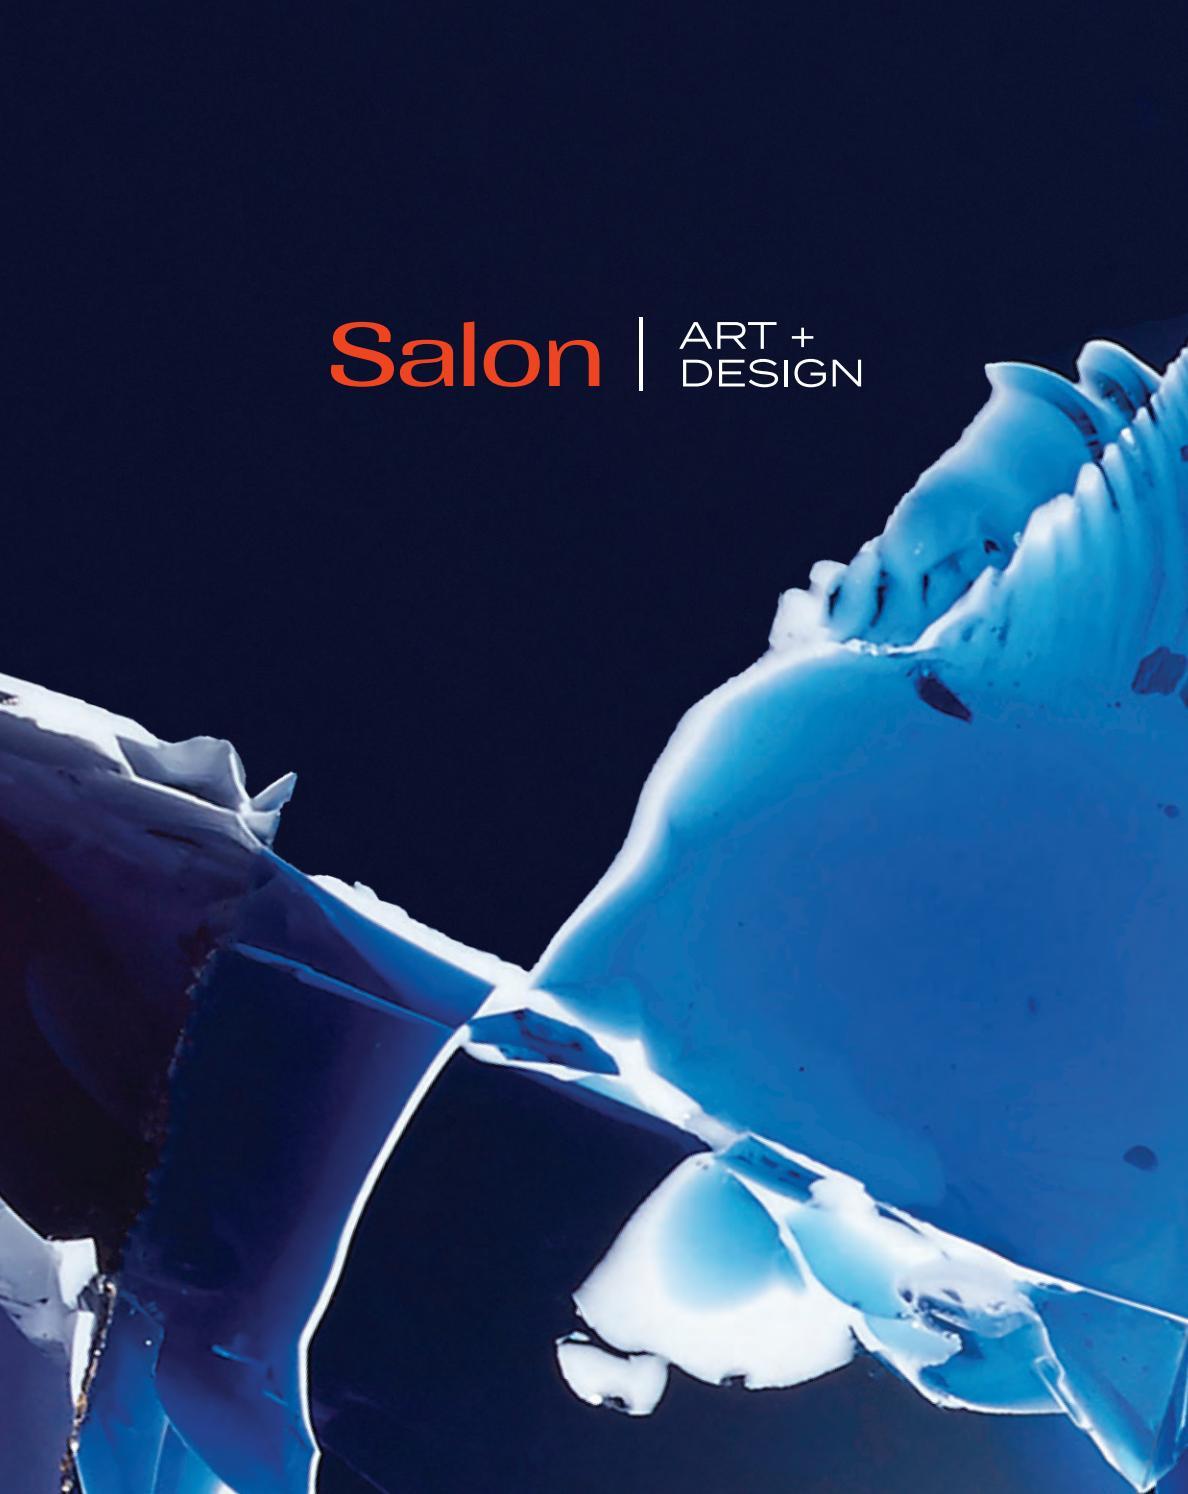 2019 Salon Art + Design Catalog By Sanford L. Smith + ... concernant Salon De Jardin Nevada